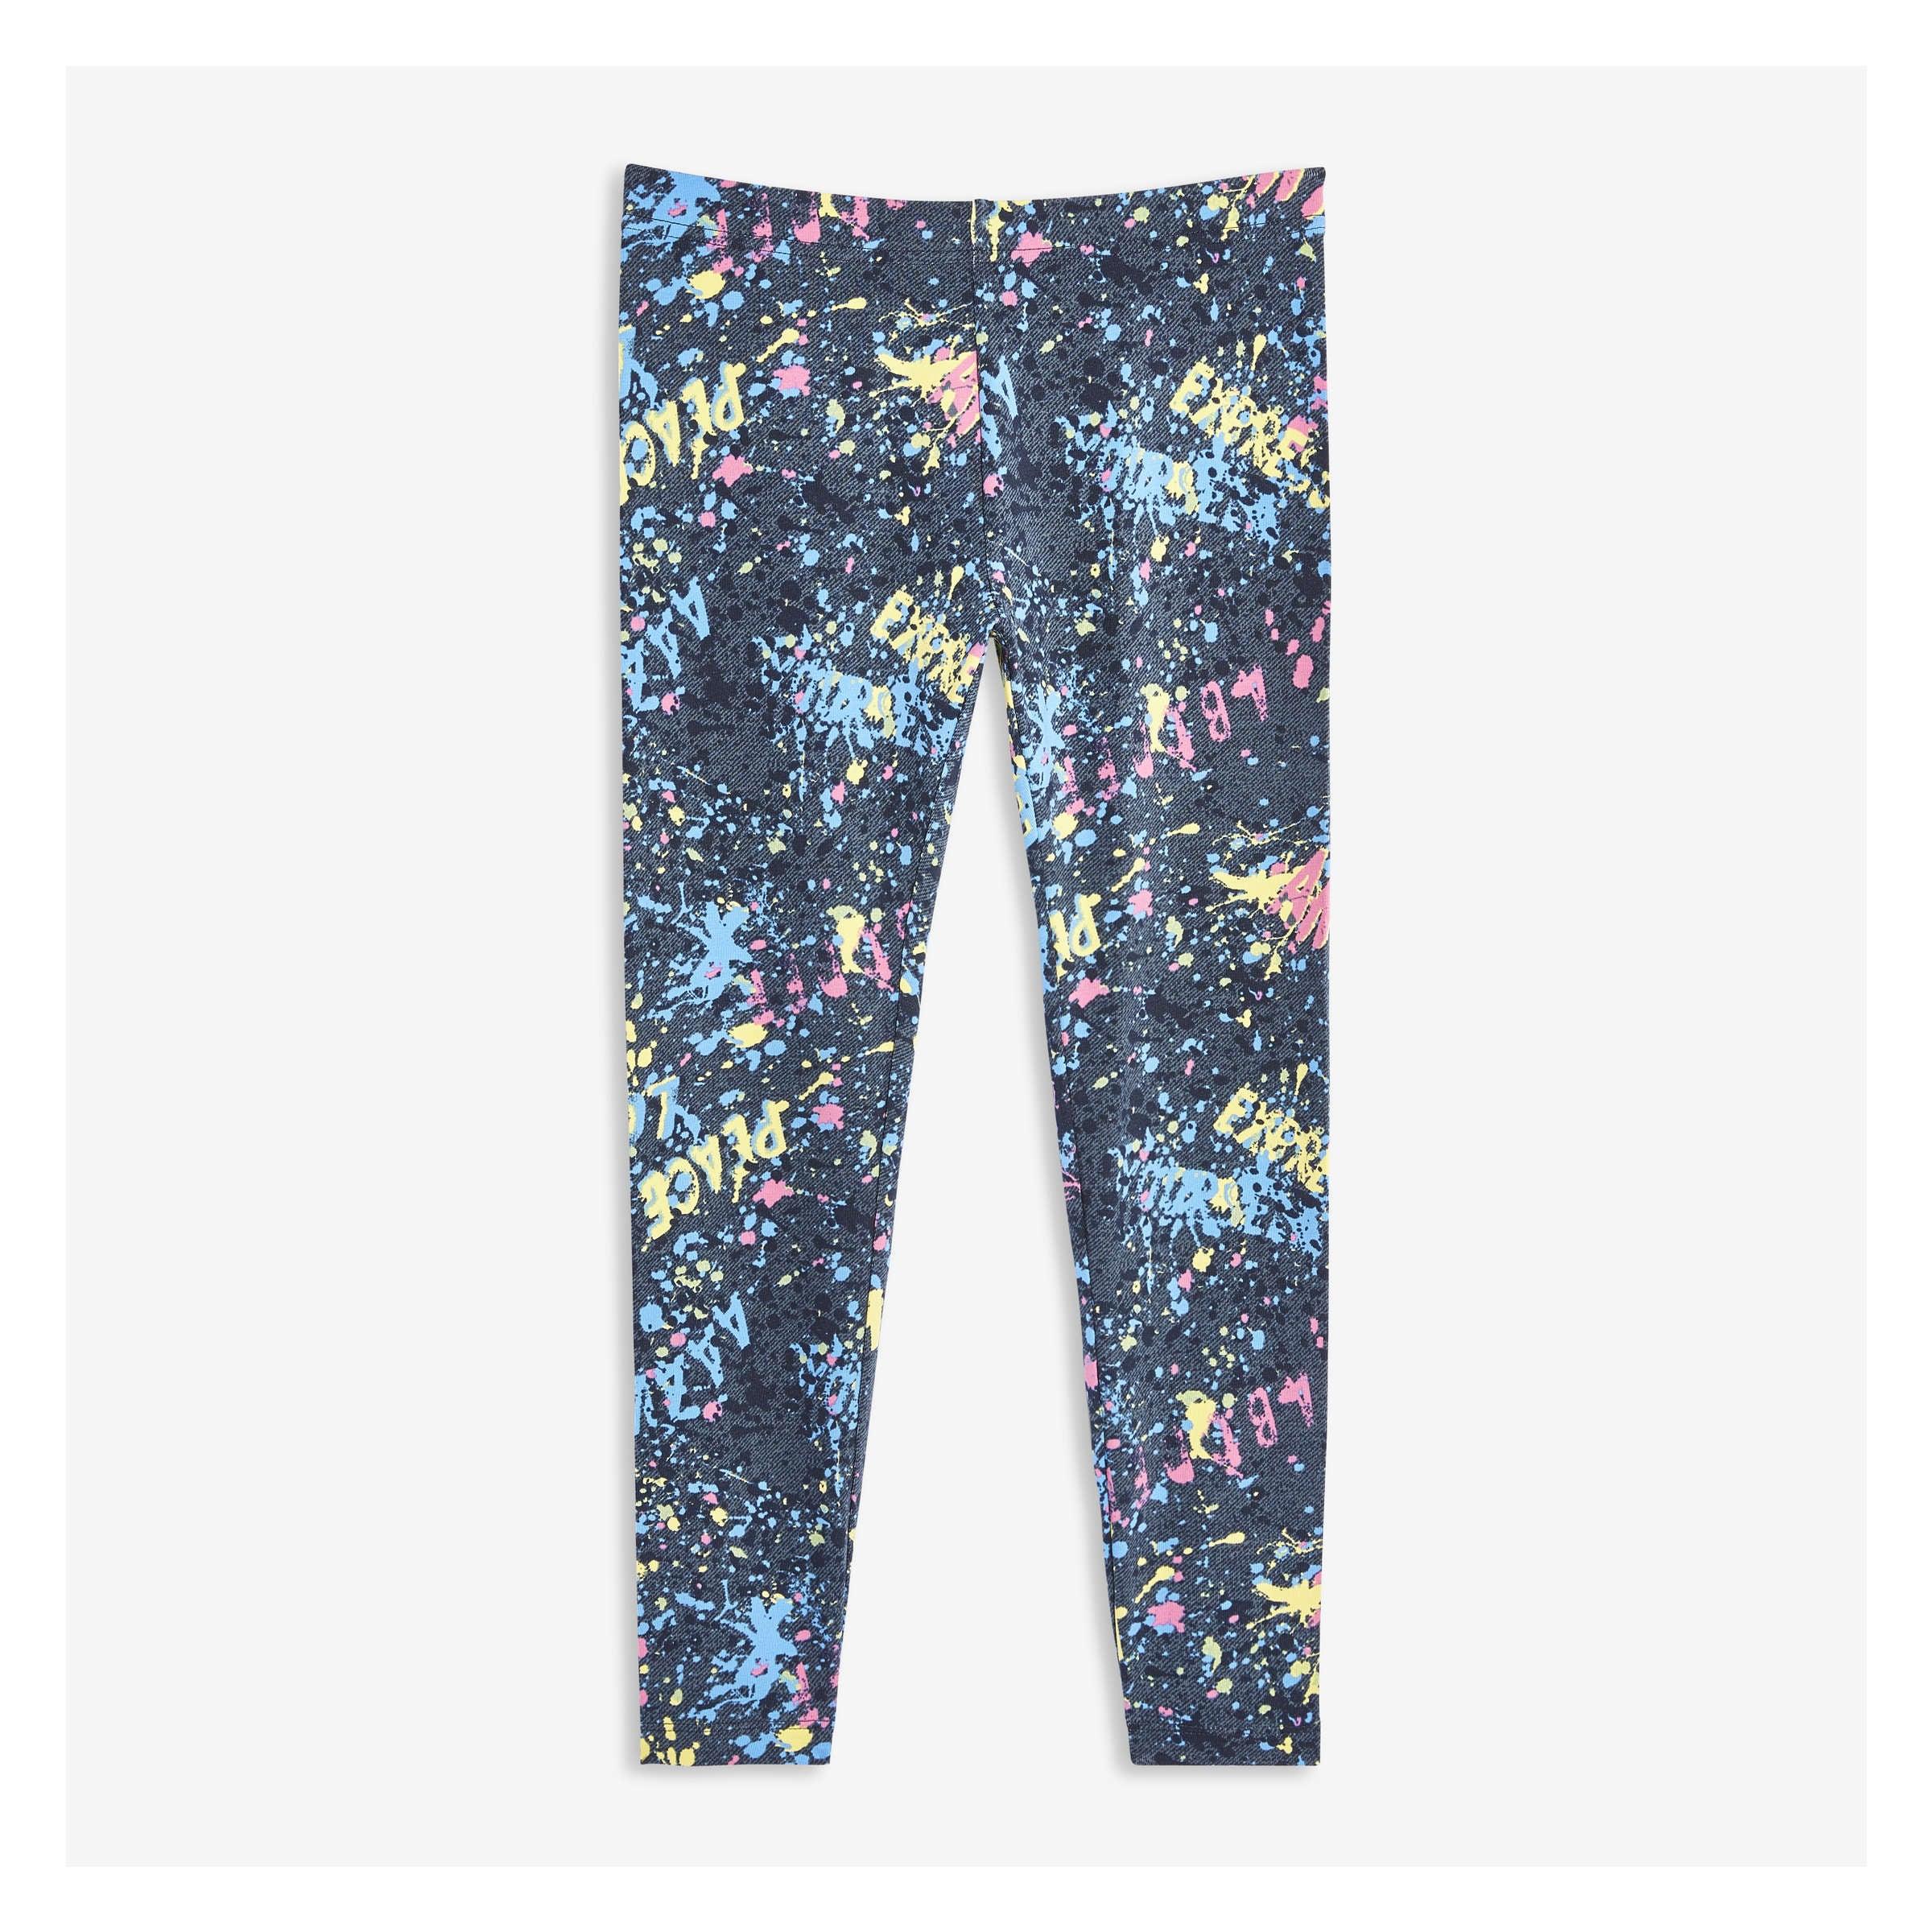 aa698214cca44 Kid Girls' Print Legging in JF Midnight Blue from Joe Fresh